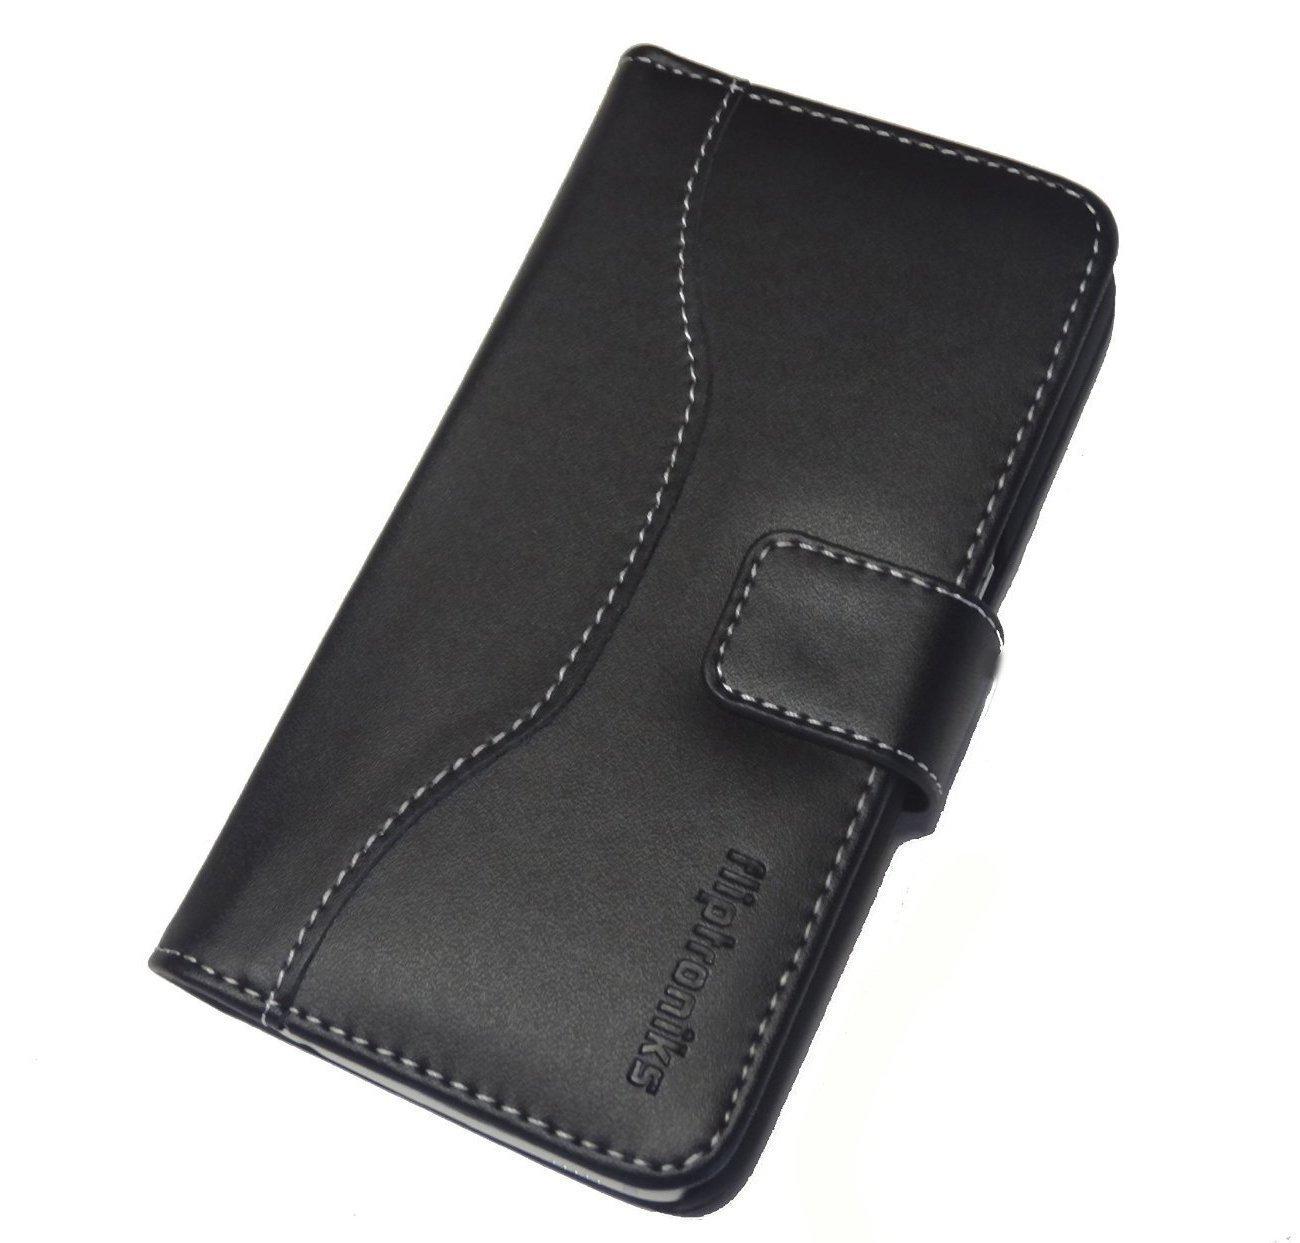 Fliptroniks Htc One M8 Luxury Case Top 3 Benefits